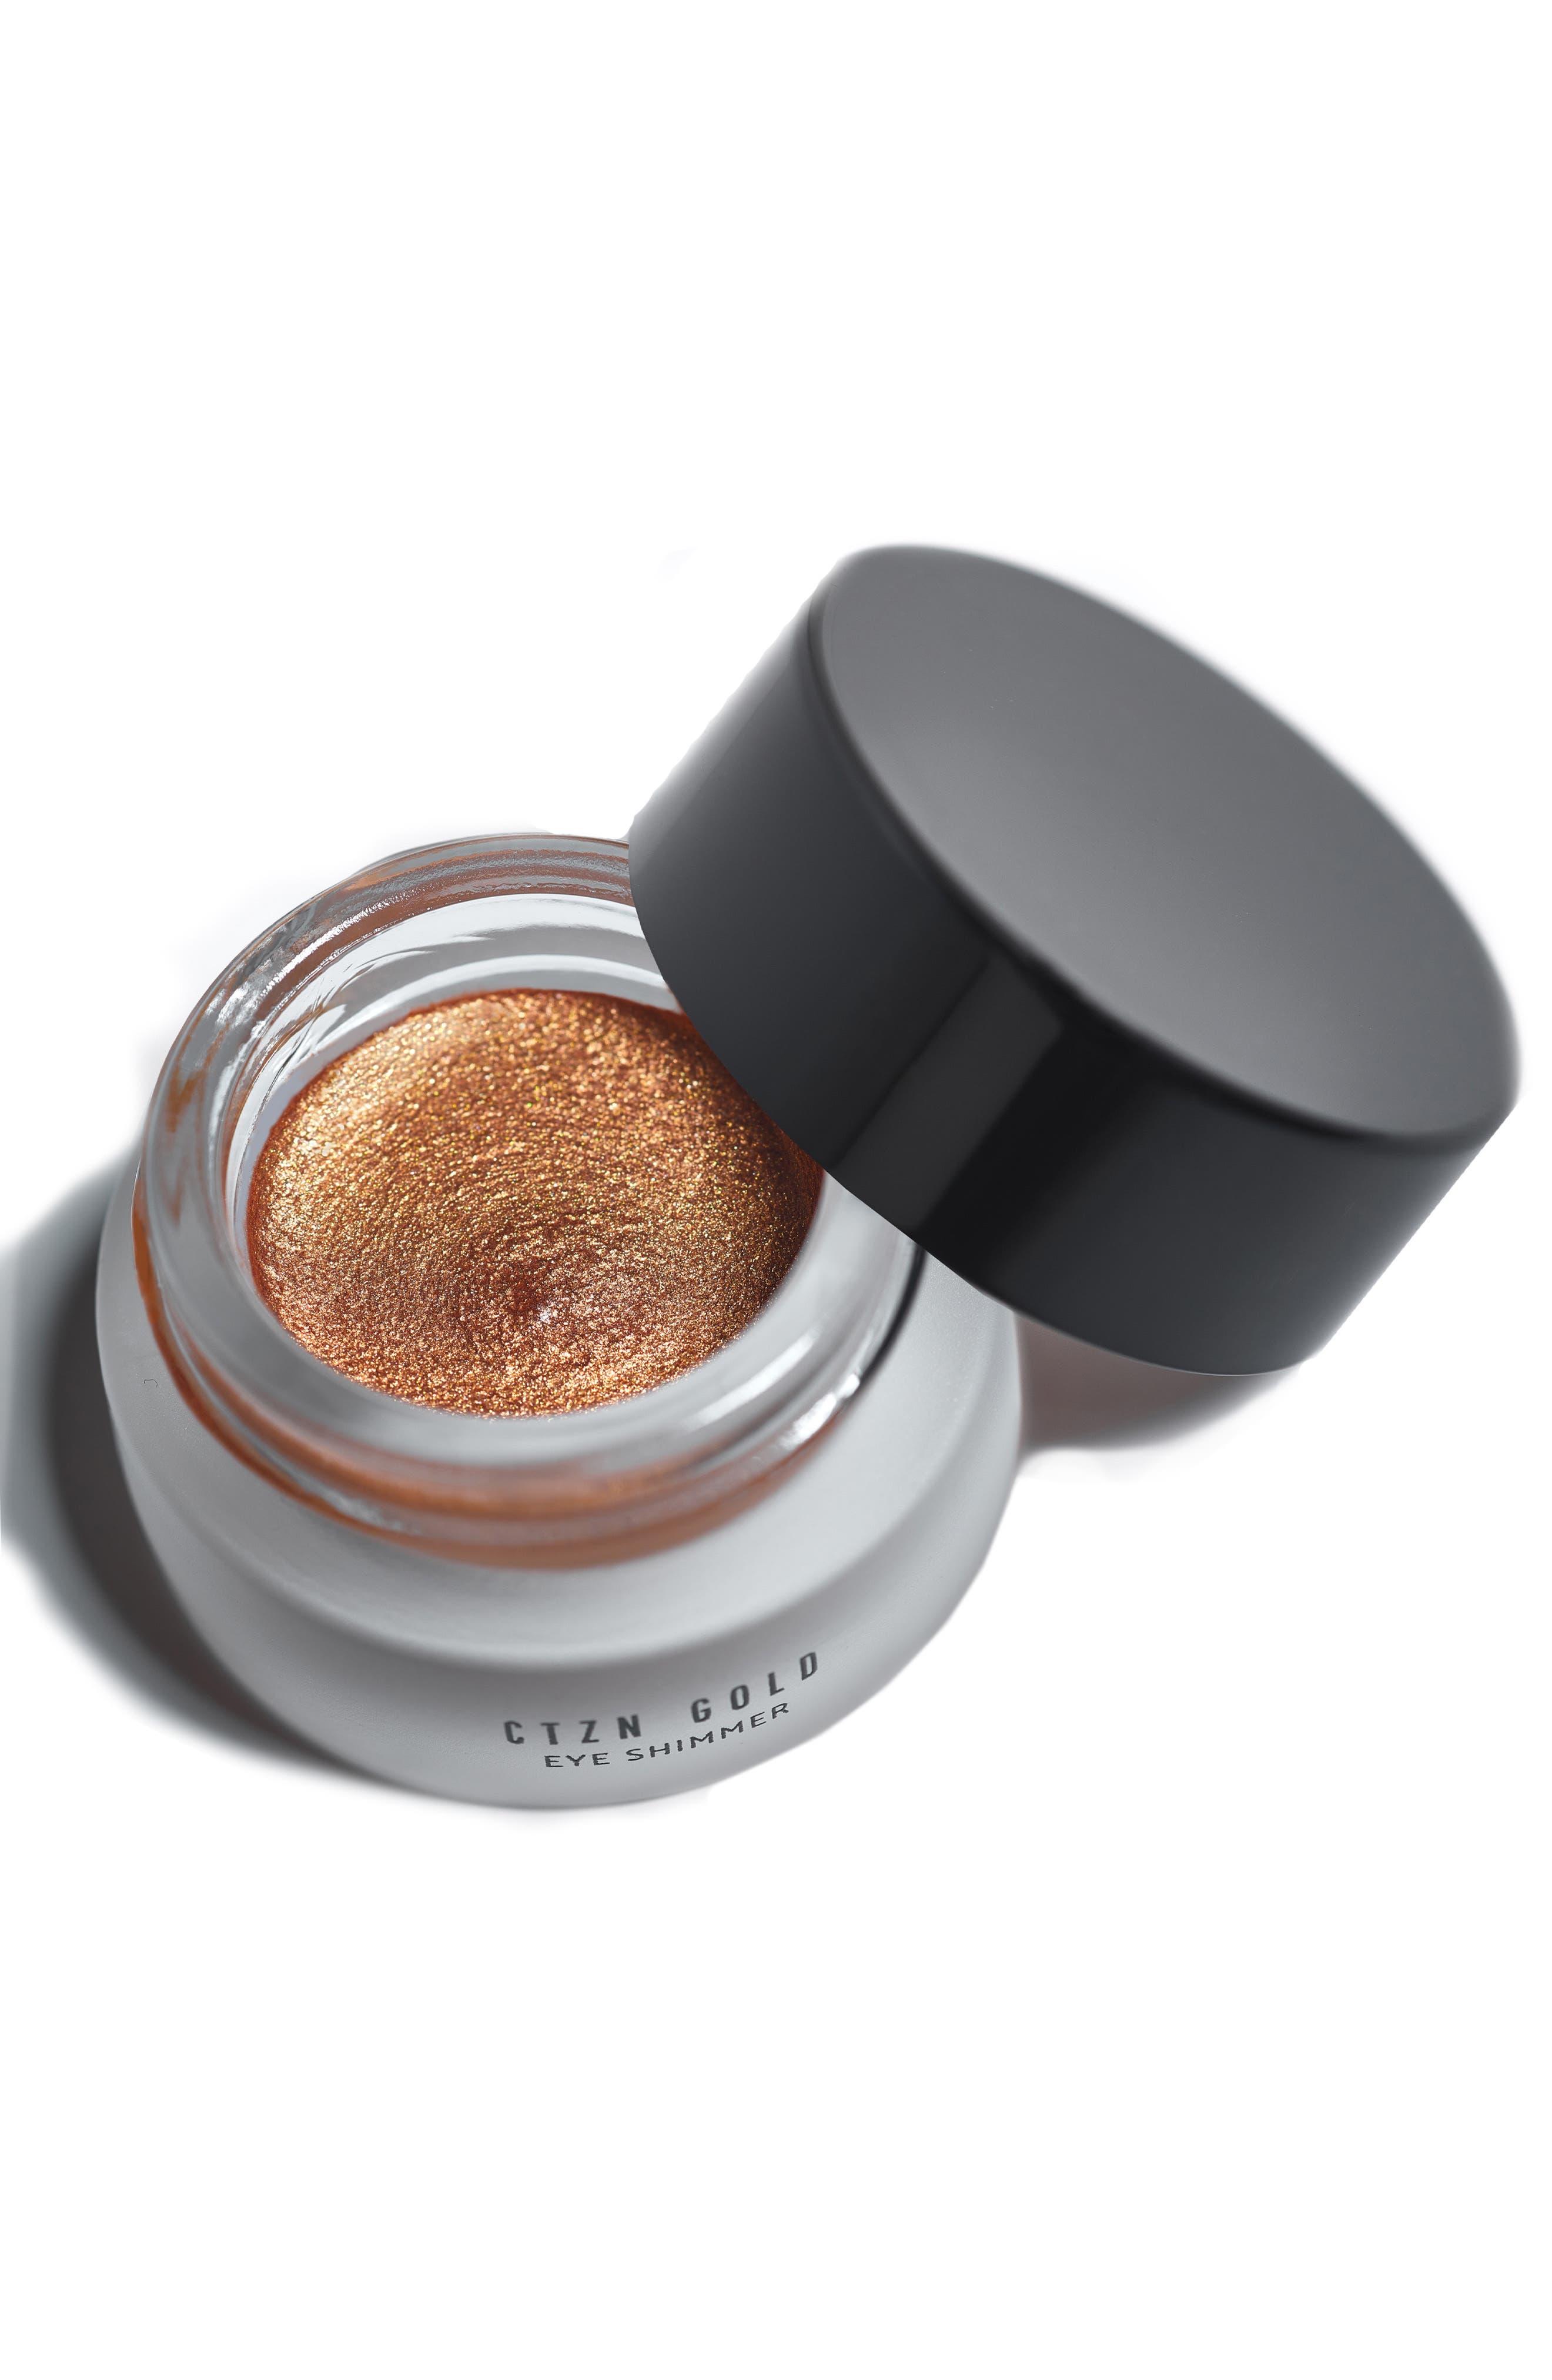 Ctzn Gold Cream Eyeshadow